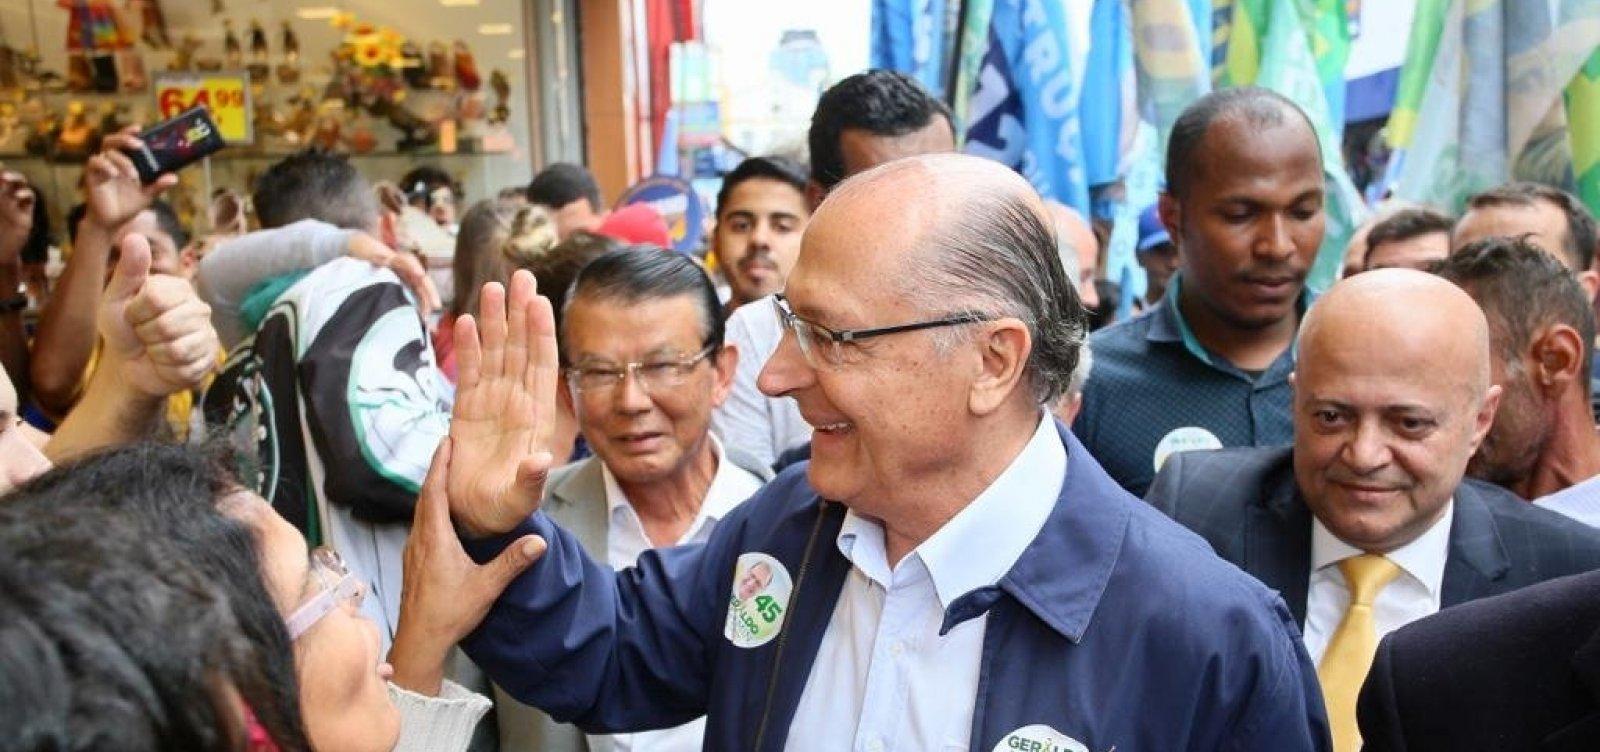 MP vai apurar se decretos assinados por Alckmin beneficiaram familiares